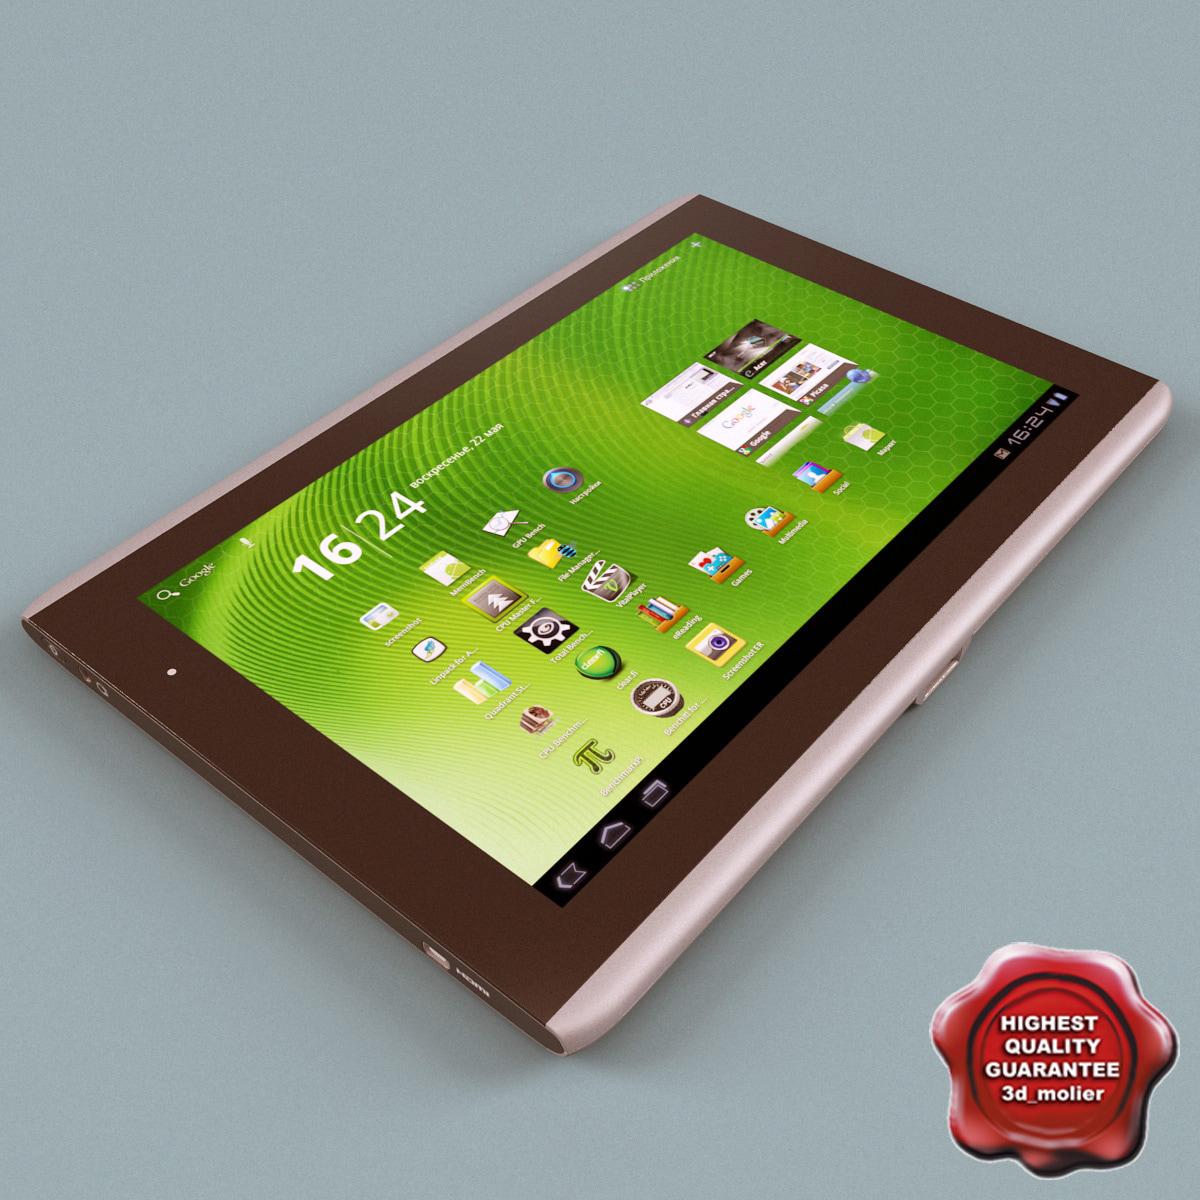 Acer_Iconia_Tab_A500_00.jpg